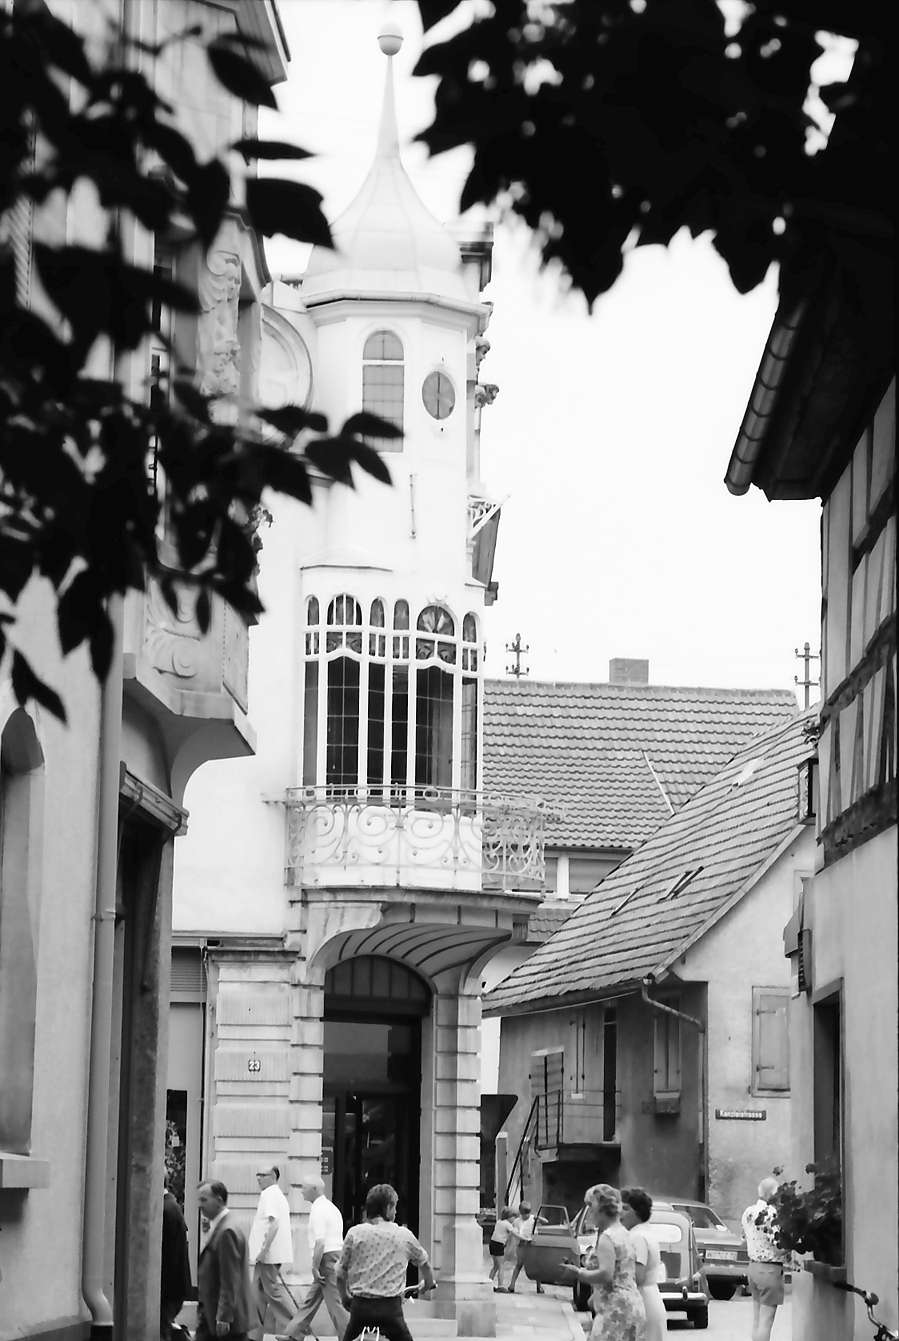 Zell am Harmersbach: Jugendstilerker in der Hauptstraße, Bild 1